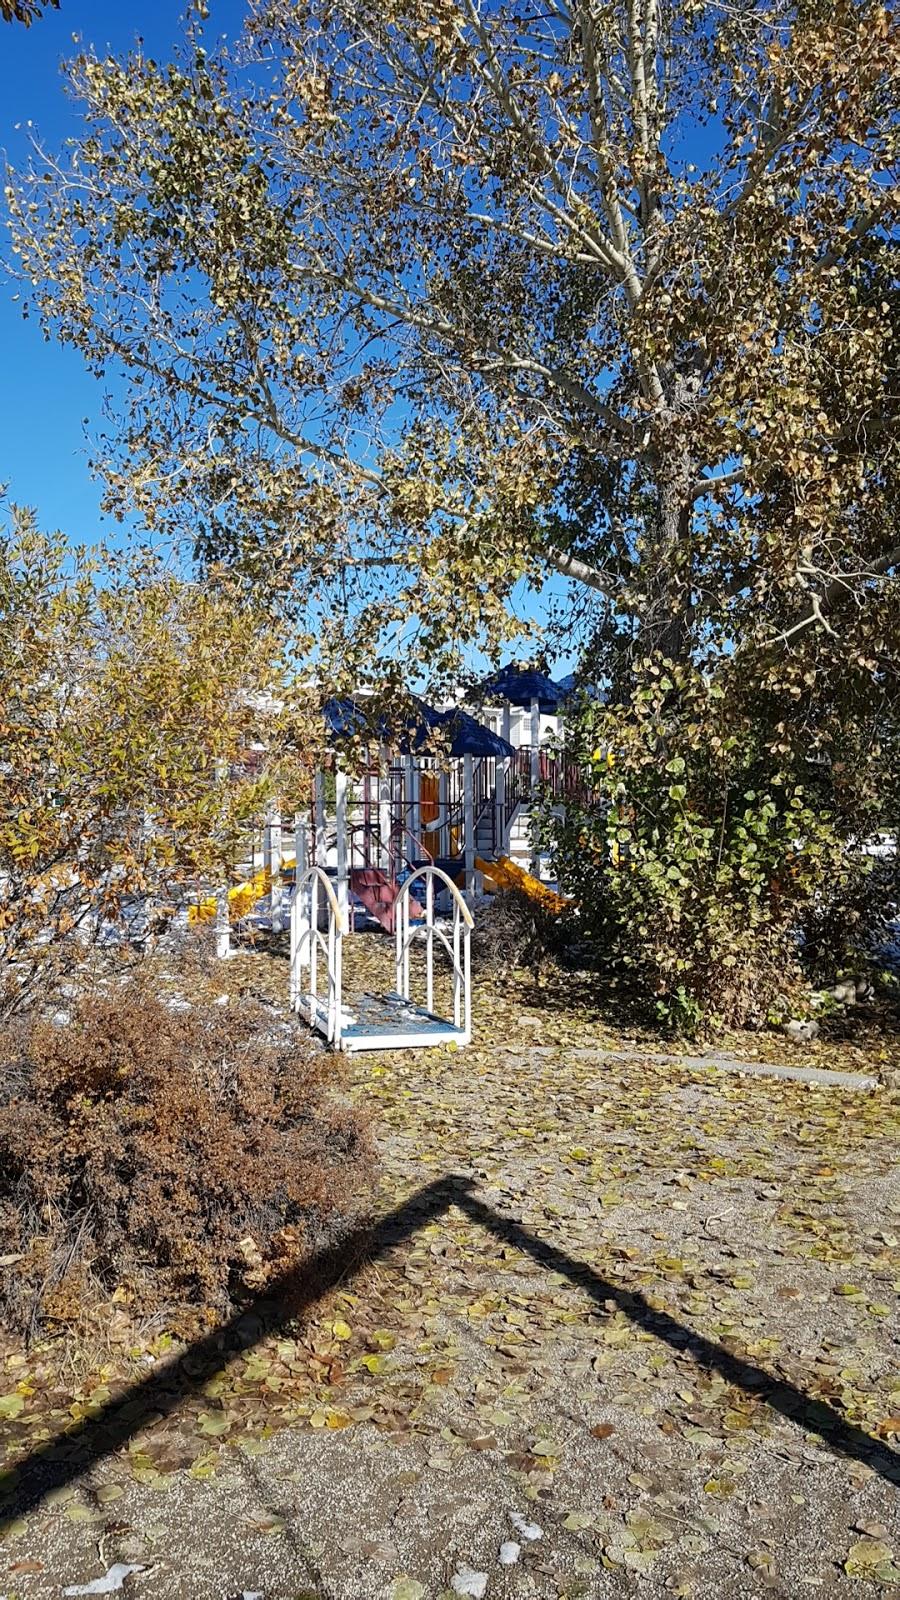 Citadel Gate Park | 152 Citadel Dr NW, Calgary, AB T3G 3V3